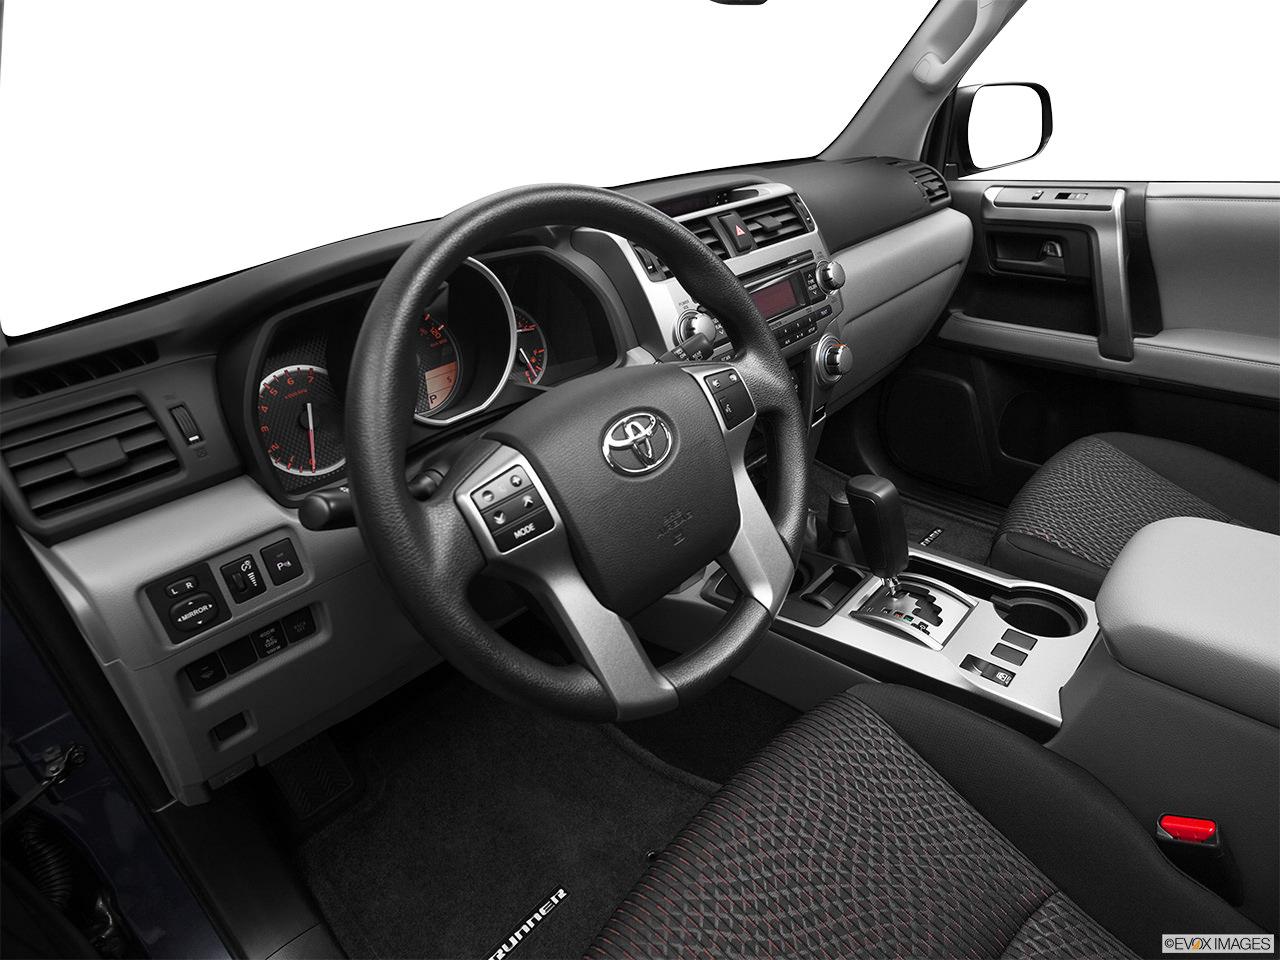 Toyota 4Runner 2012 Interior